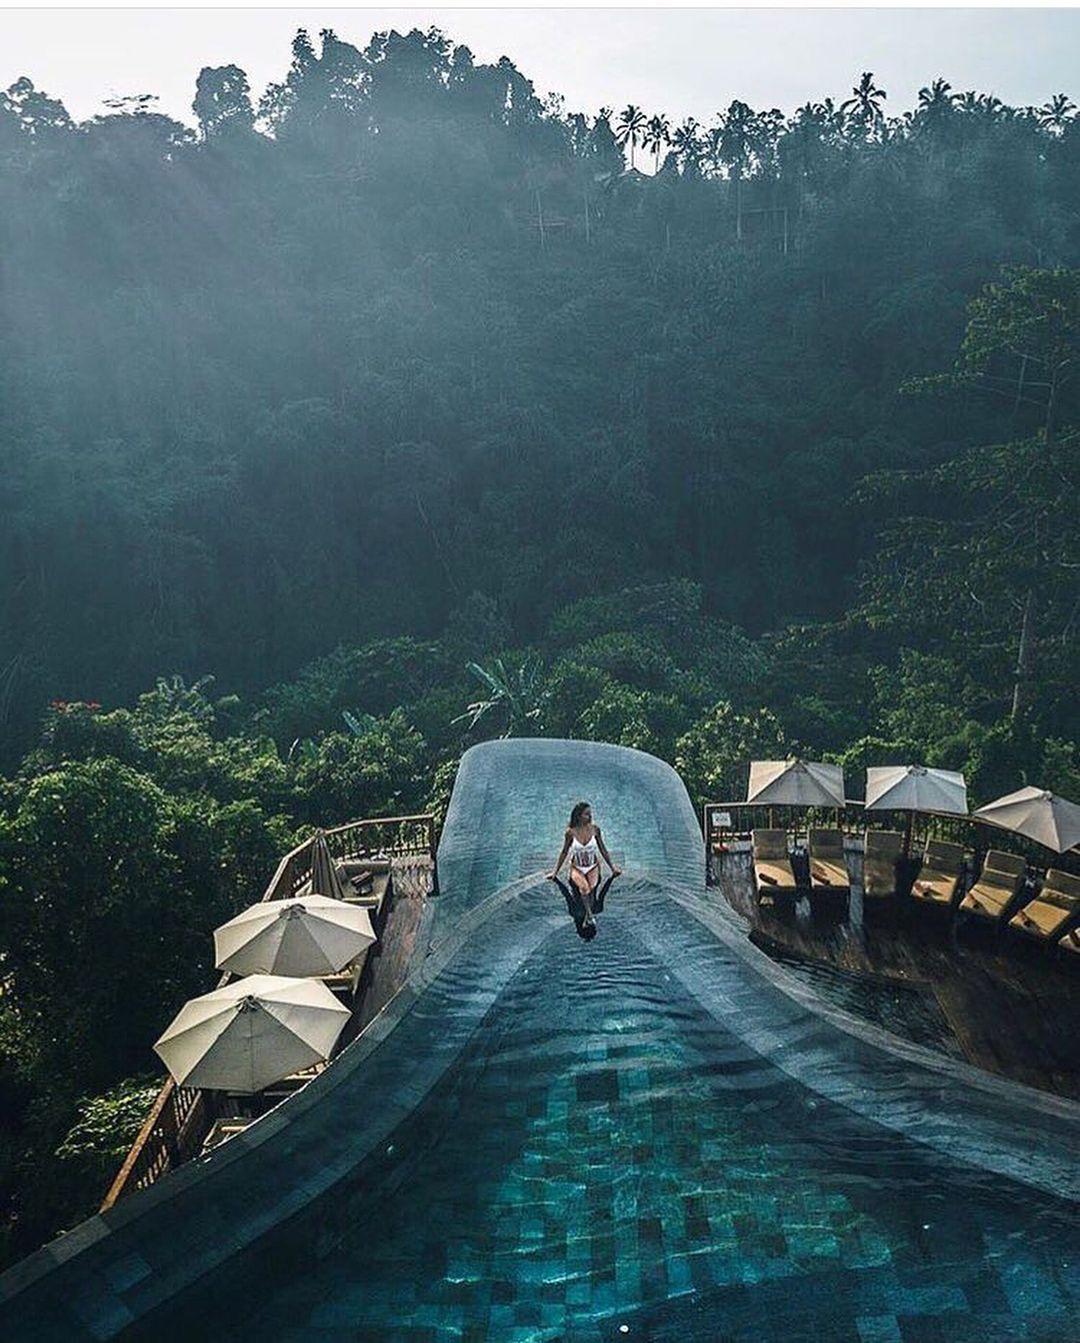 Visiter Bali, Indonésie 🇮🇩 #bali #indonesia #beautiful #gorgeous #destination #trip #travel #amazing #landscape #waw #need #mustgo